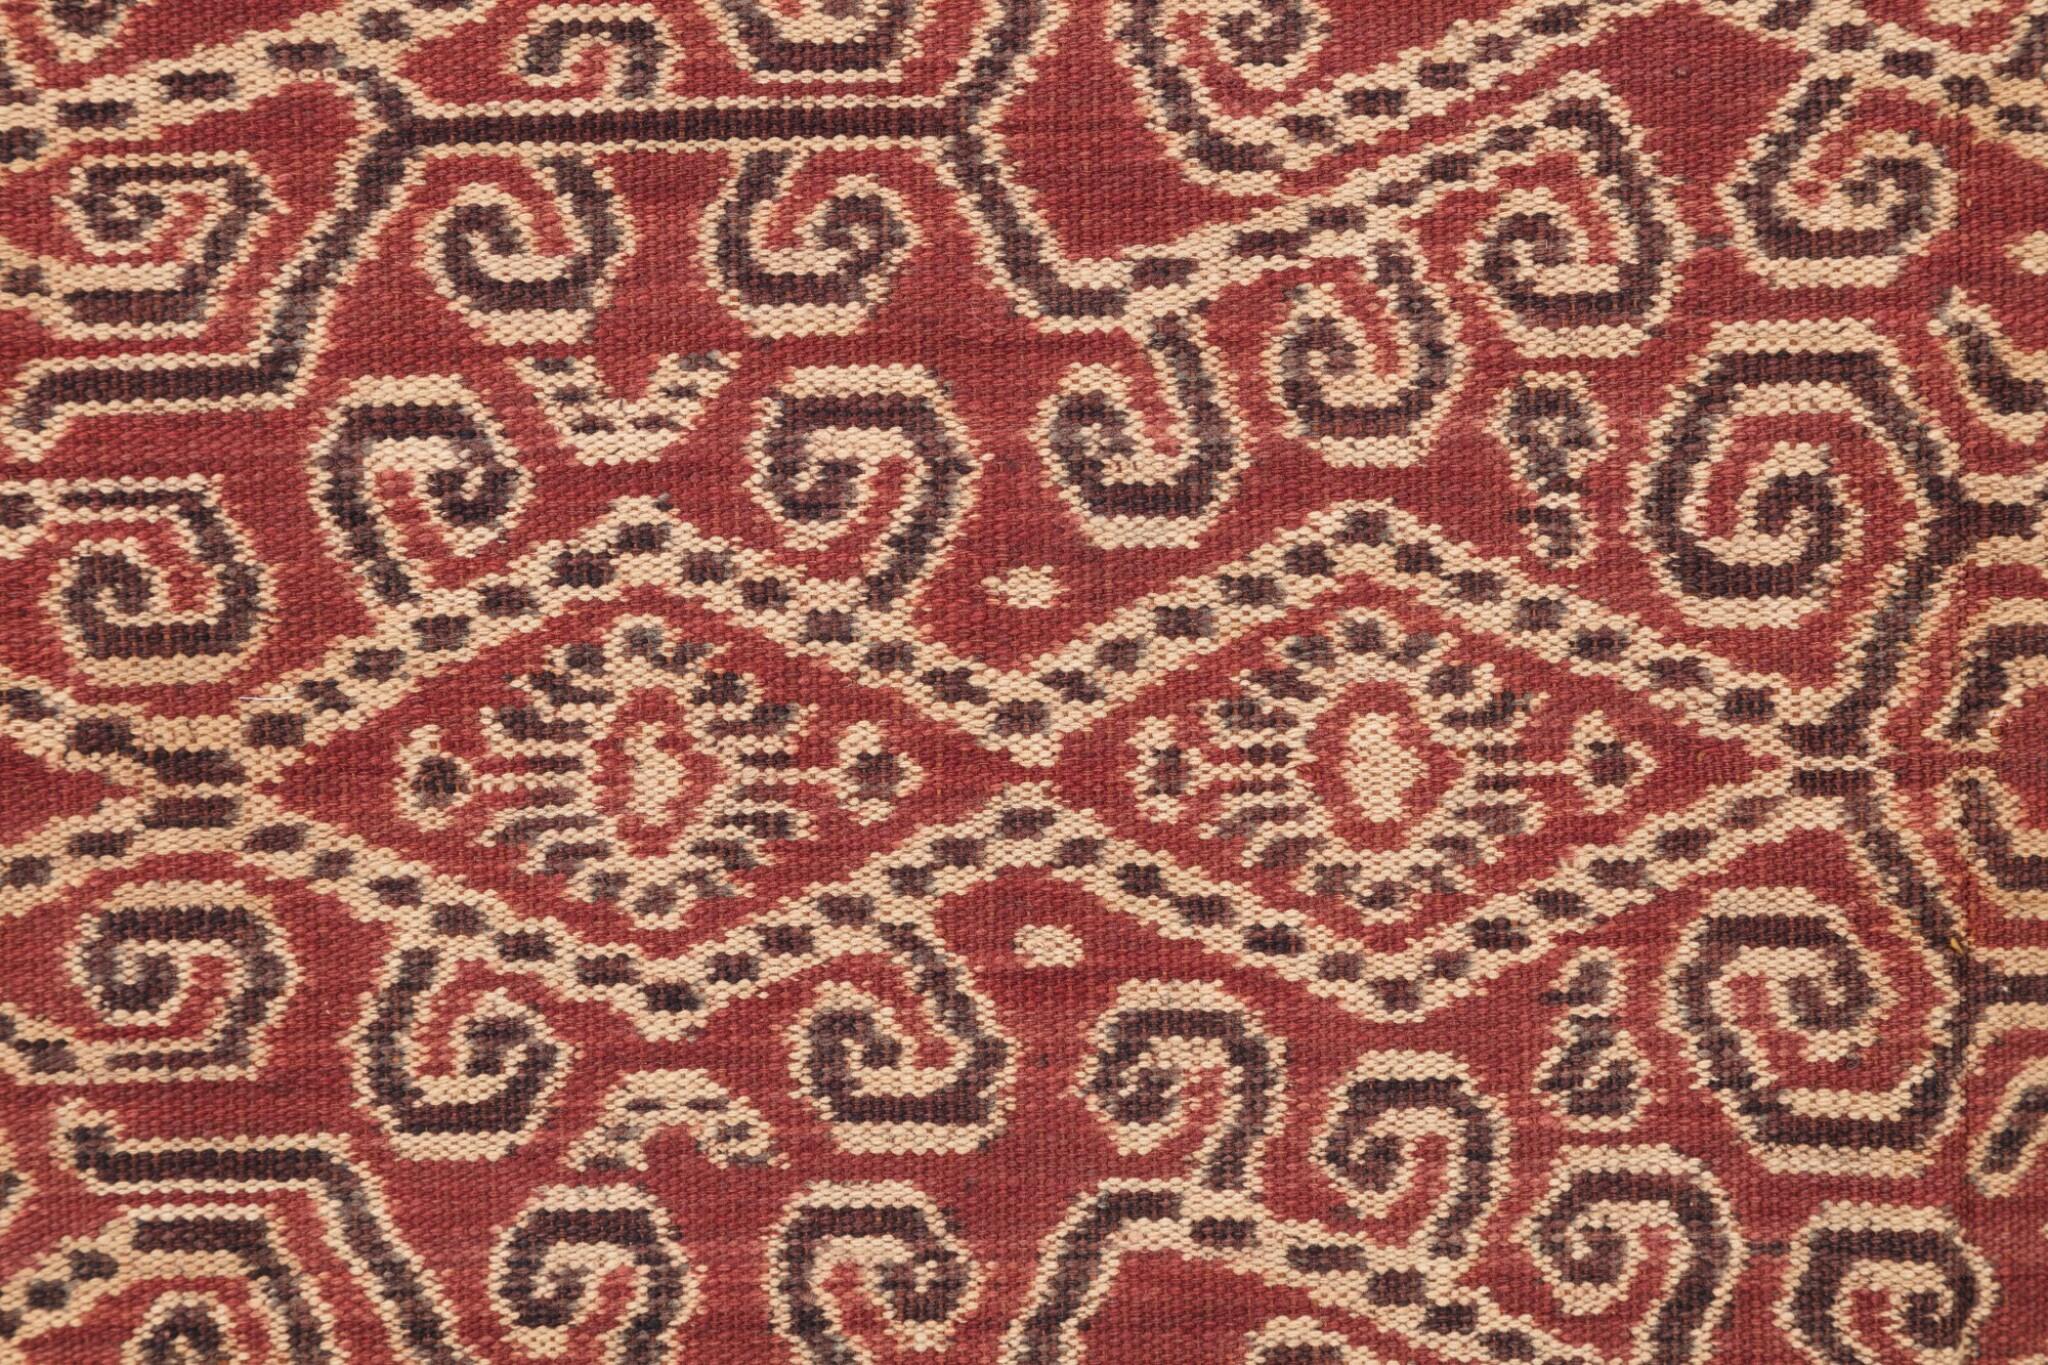 View full screen - View 1 of Lot 15. Tissu cérémoniel pua, Iban, Bornéo, Indonésie, ca.1900 | Ceremonial cloth pua, Iban, Borneo, Indonesia, about 1900.